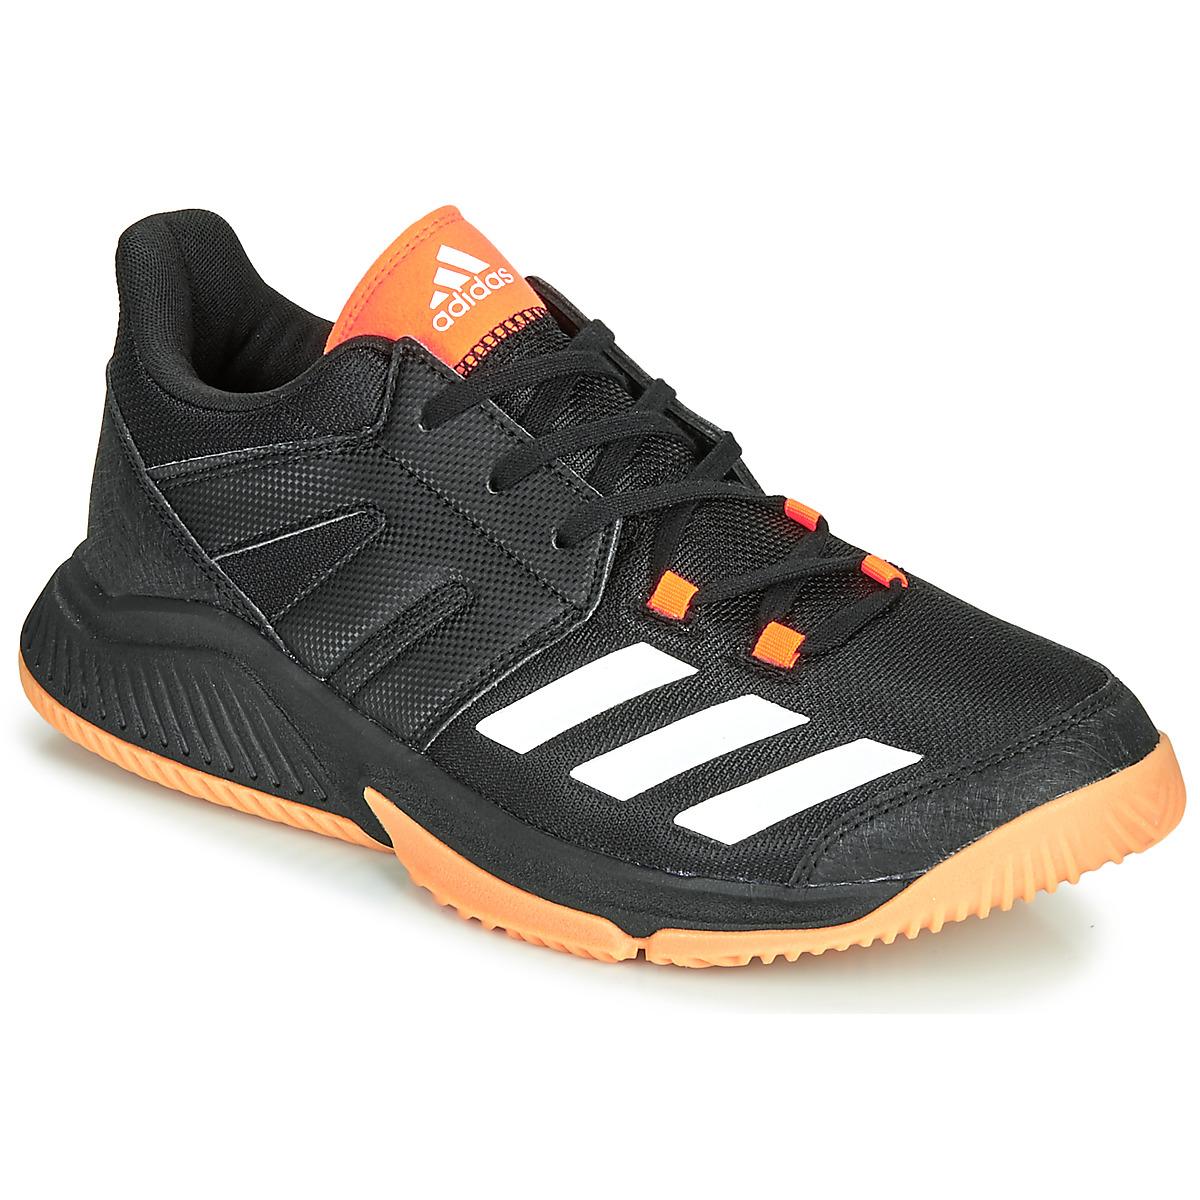 Buy Adidas Essence Multi Sports Shoes